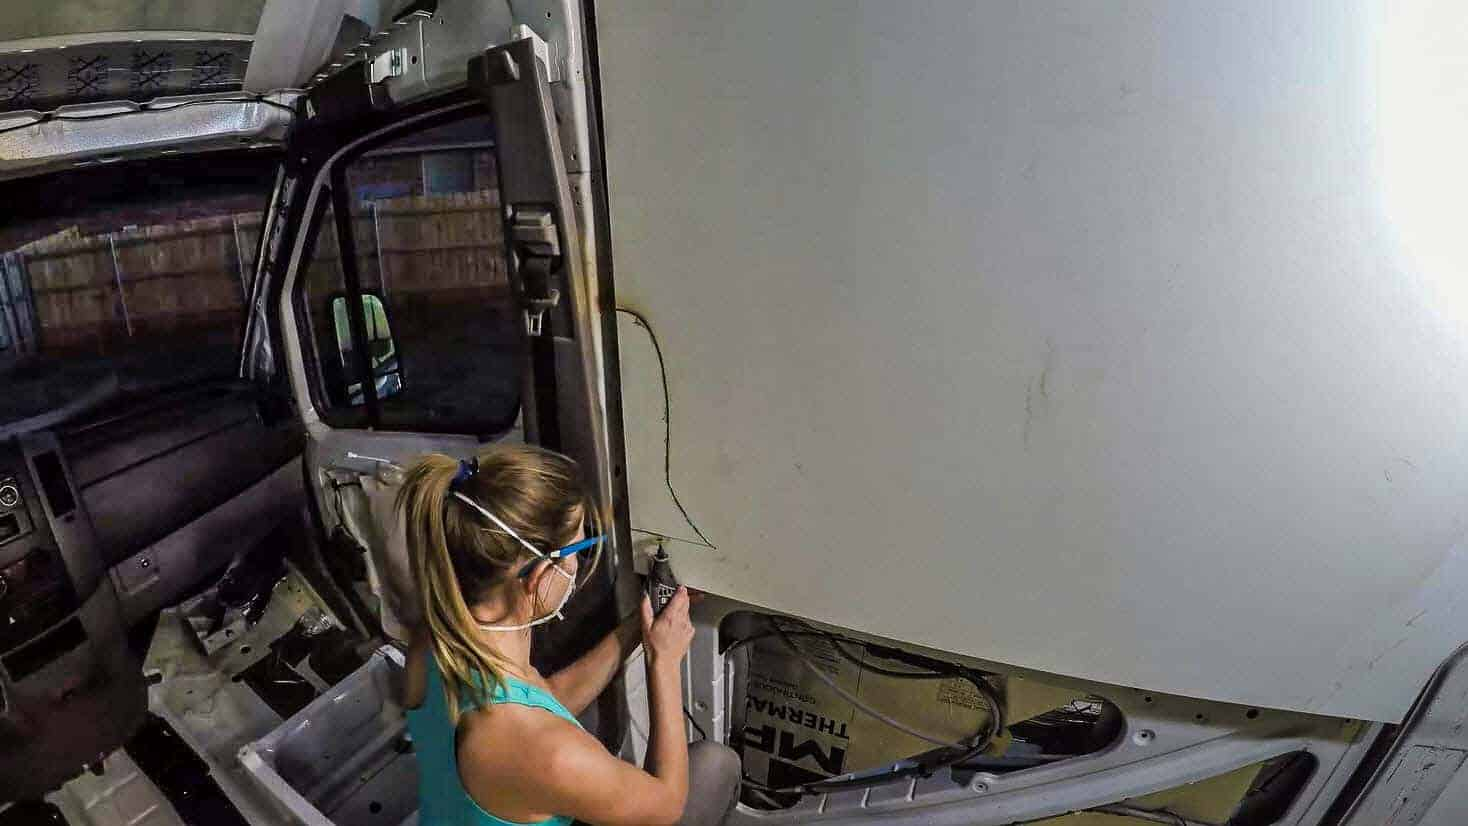 How to Install Walls in a DIY Camper Van Conversion